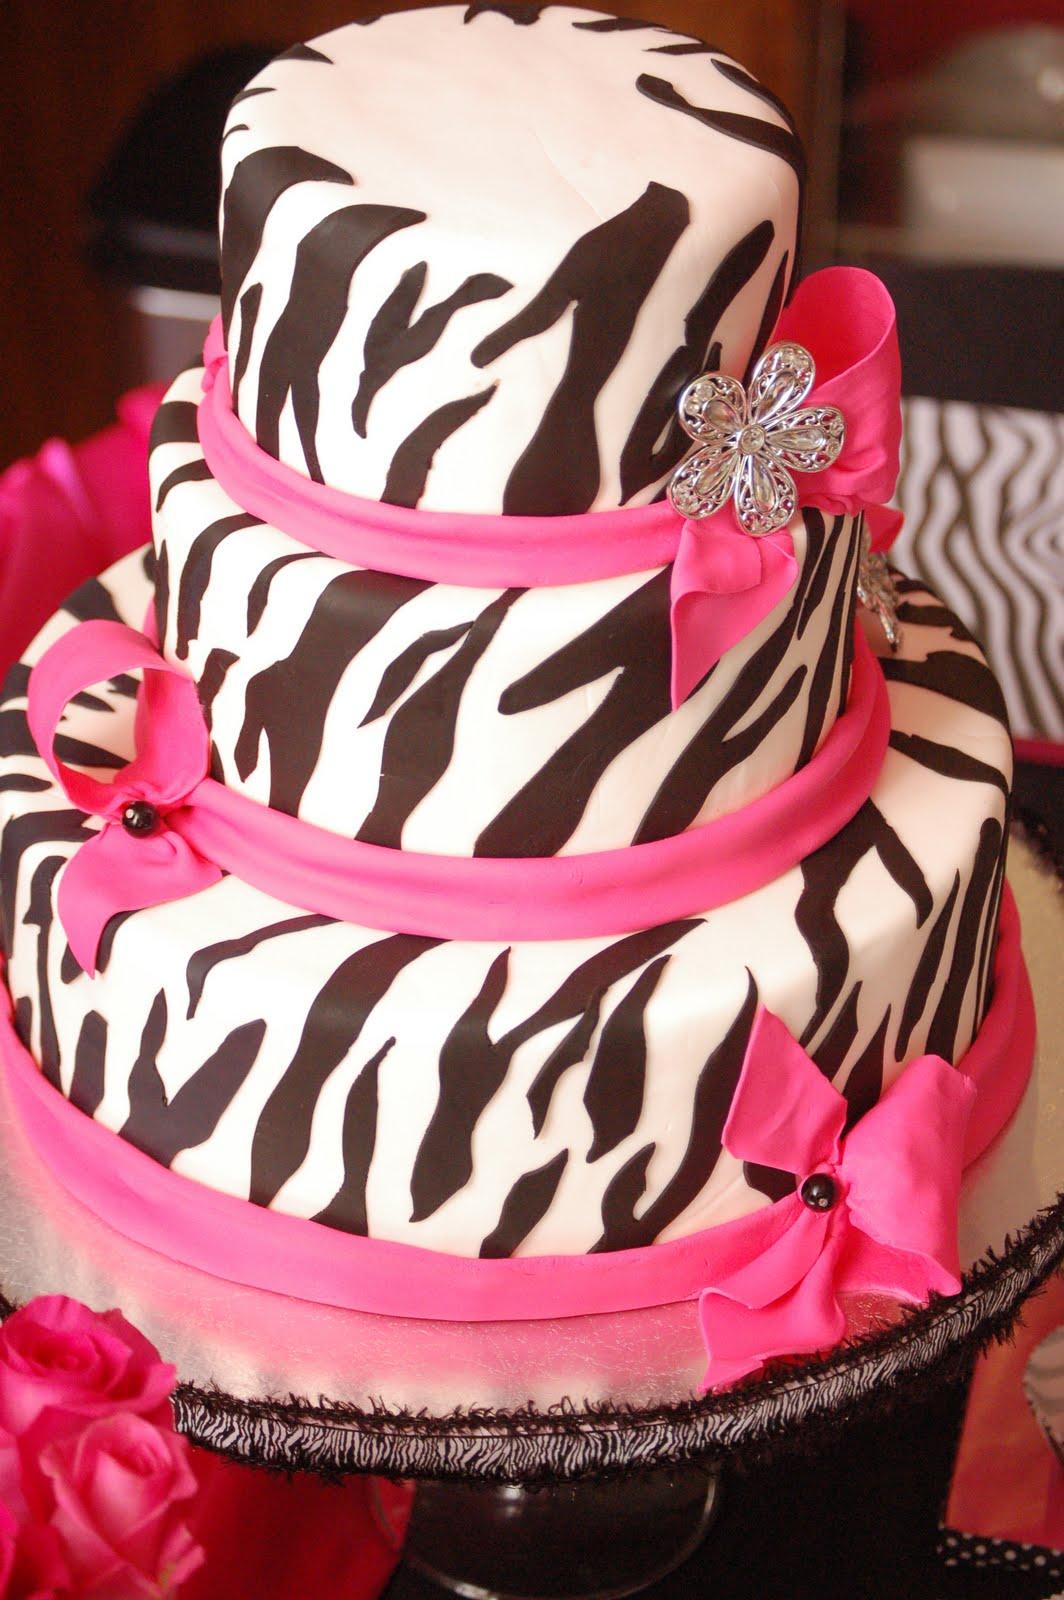 Cake Art Divas : Cakes by Tatiana: Diva Zebra Cake